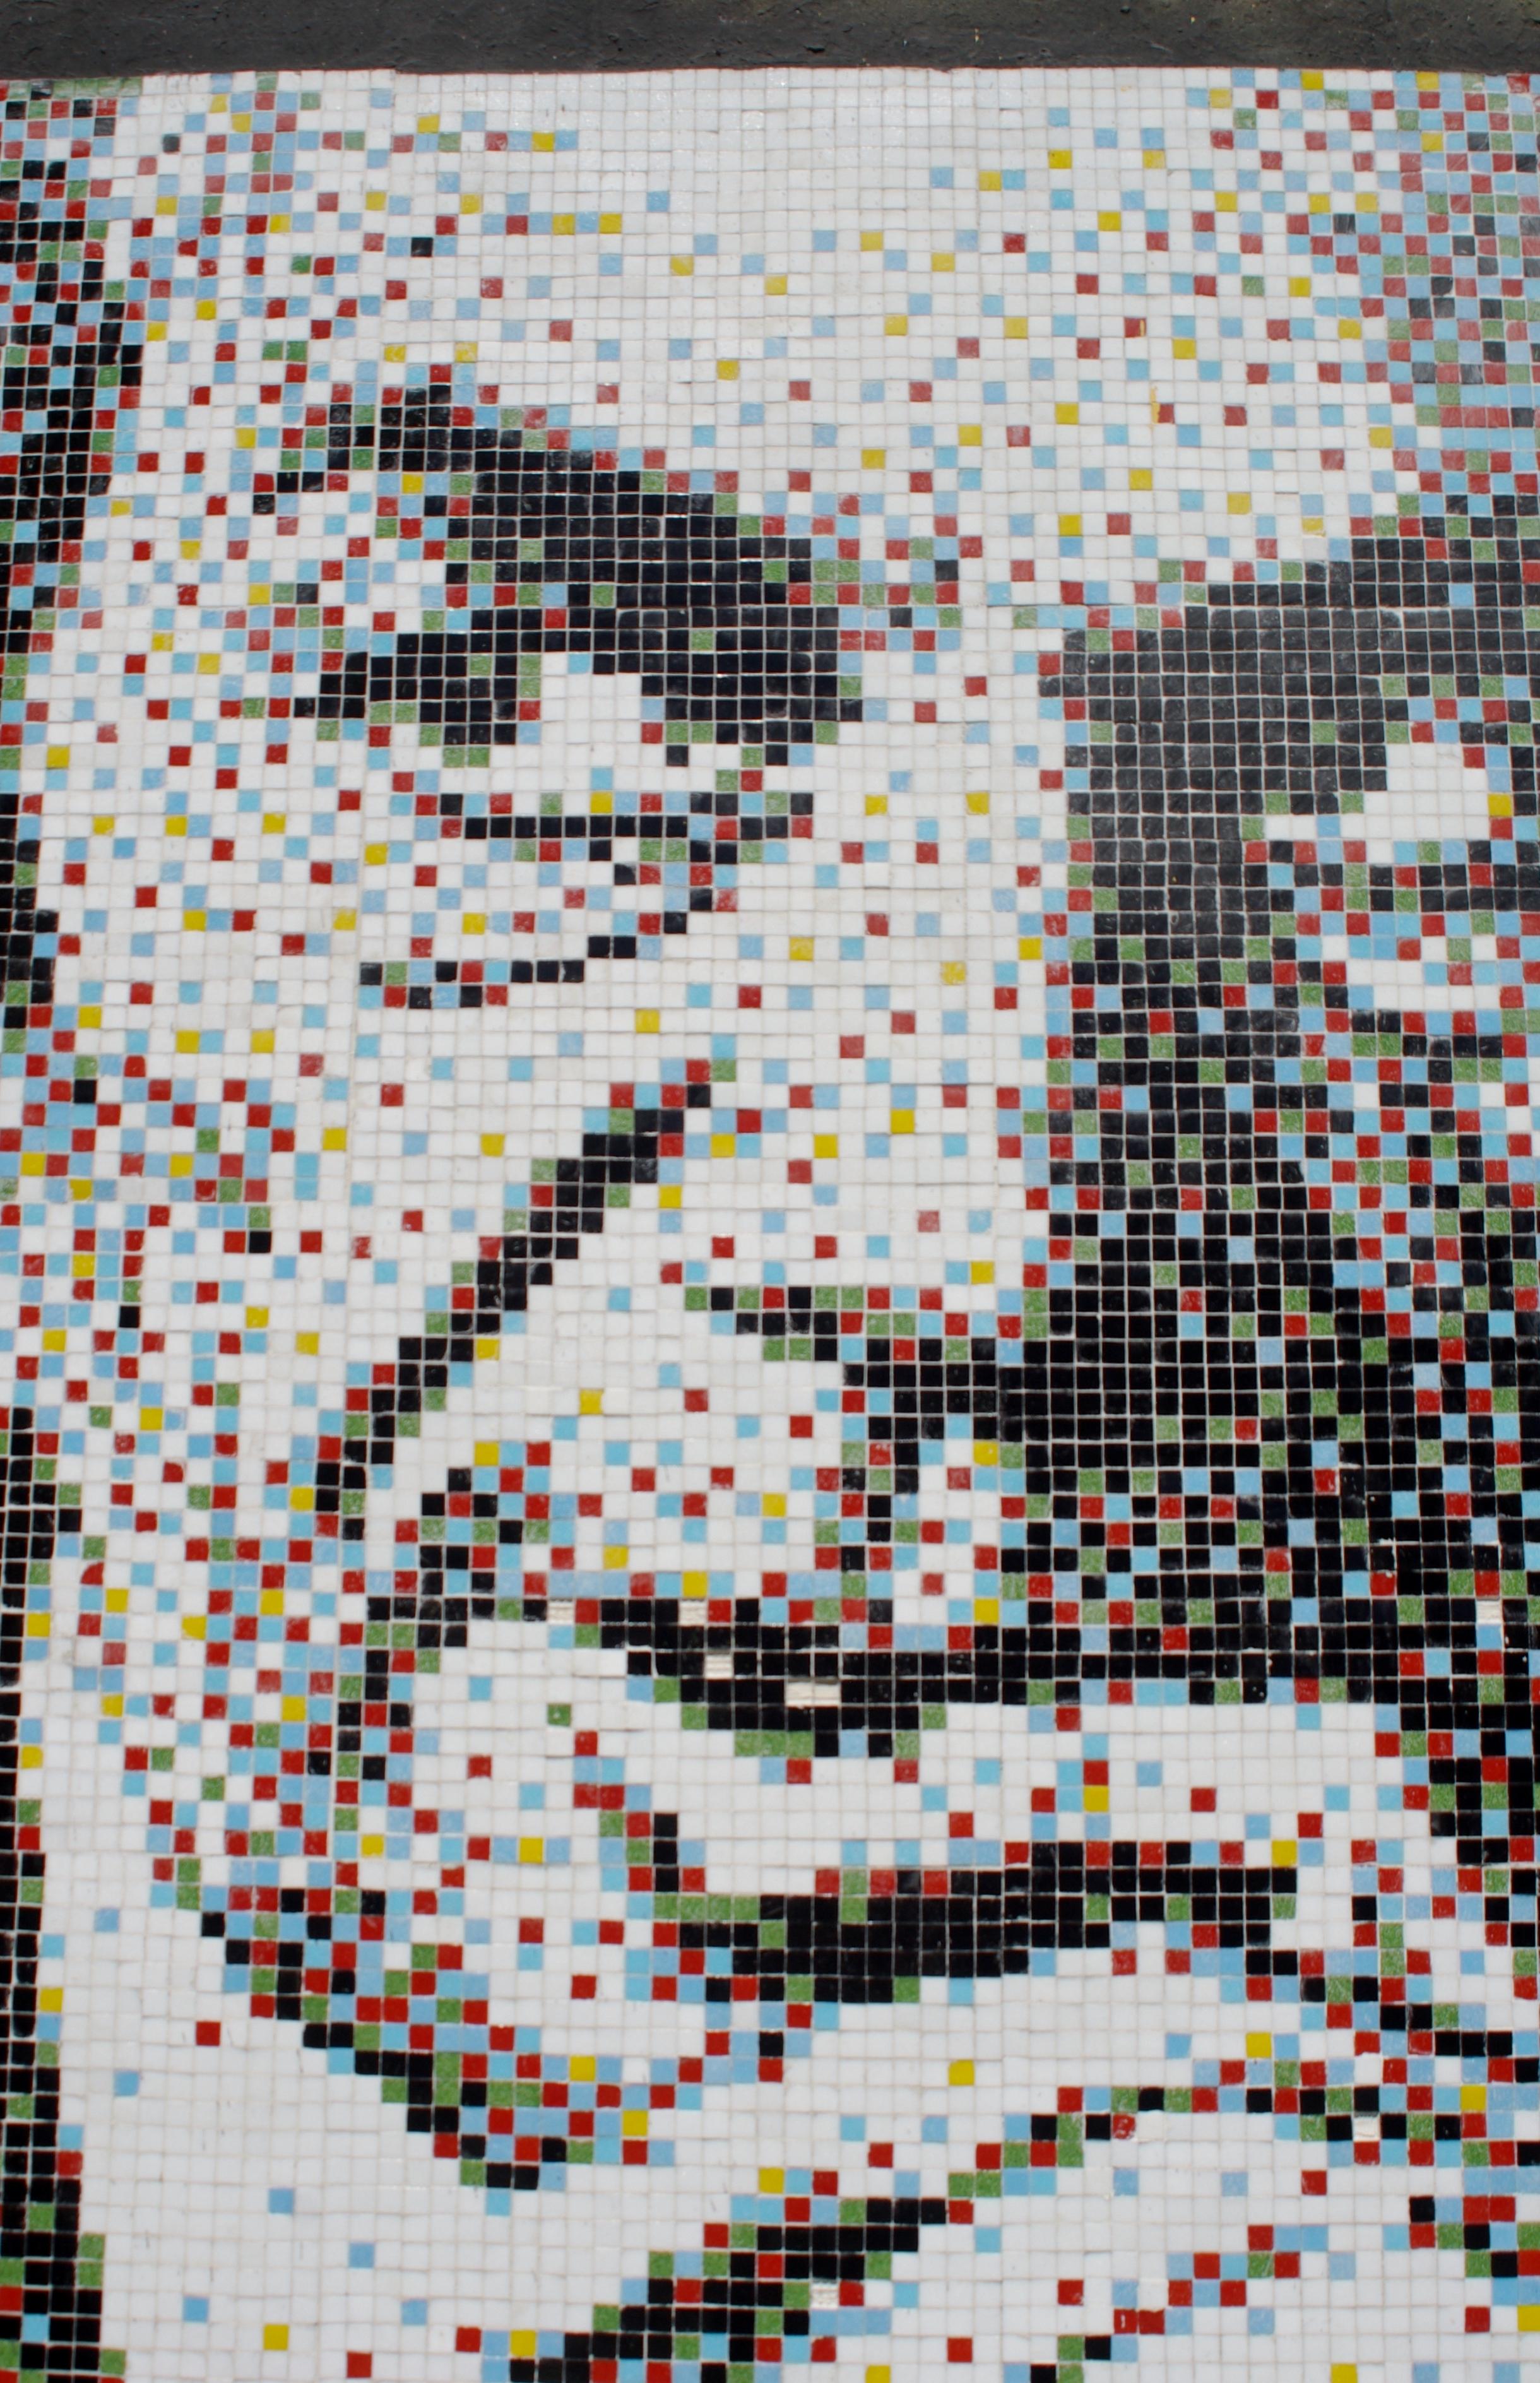 File Pixel Art Nicanor Parra Frf01 Jpg Wikimedia Commons